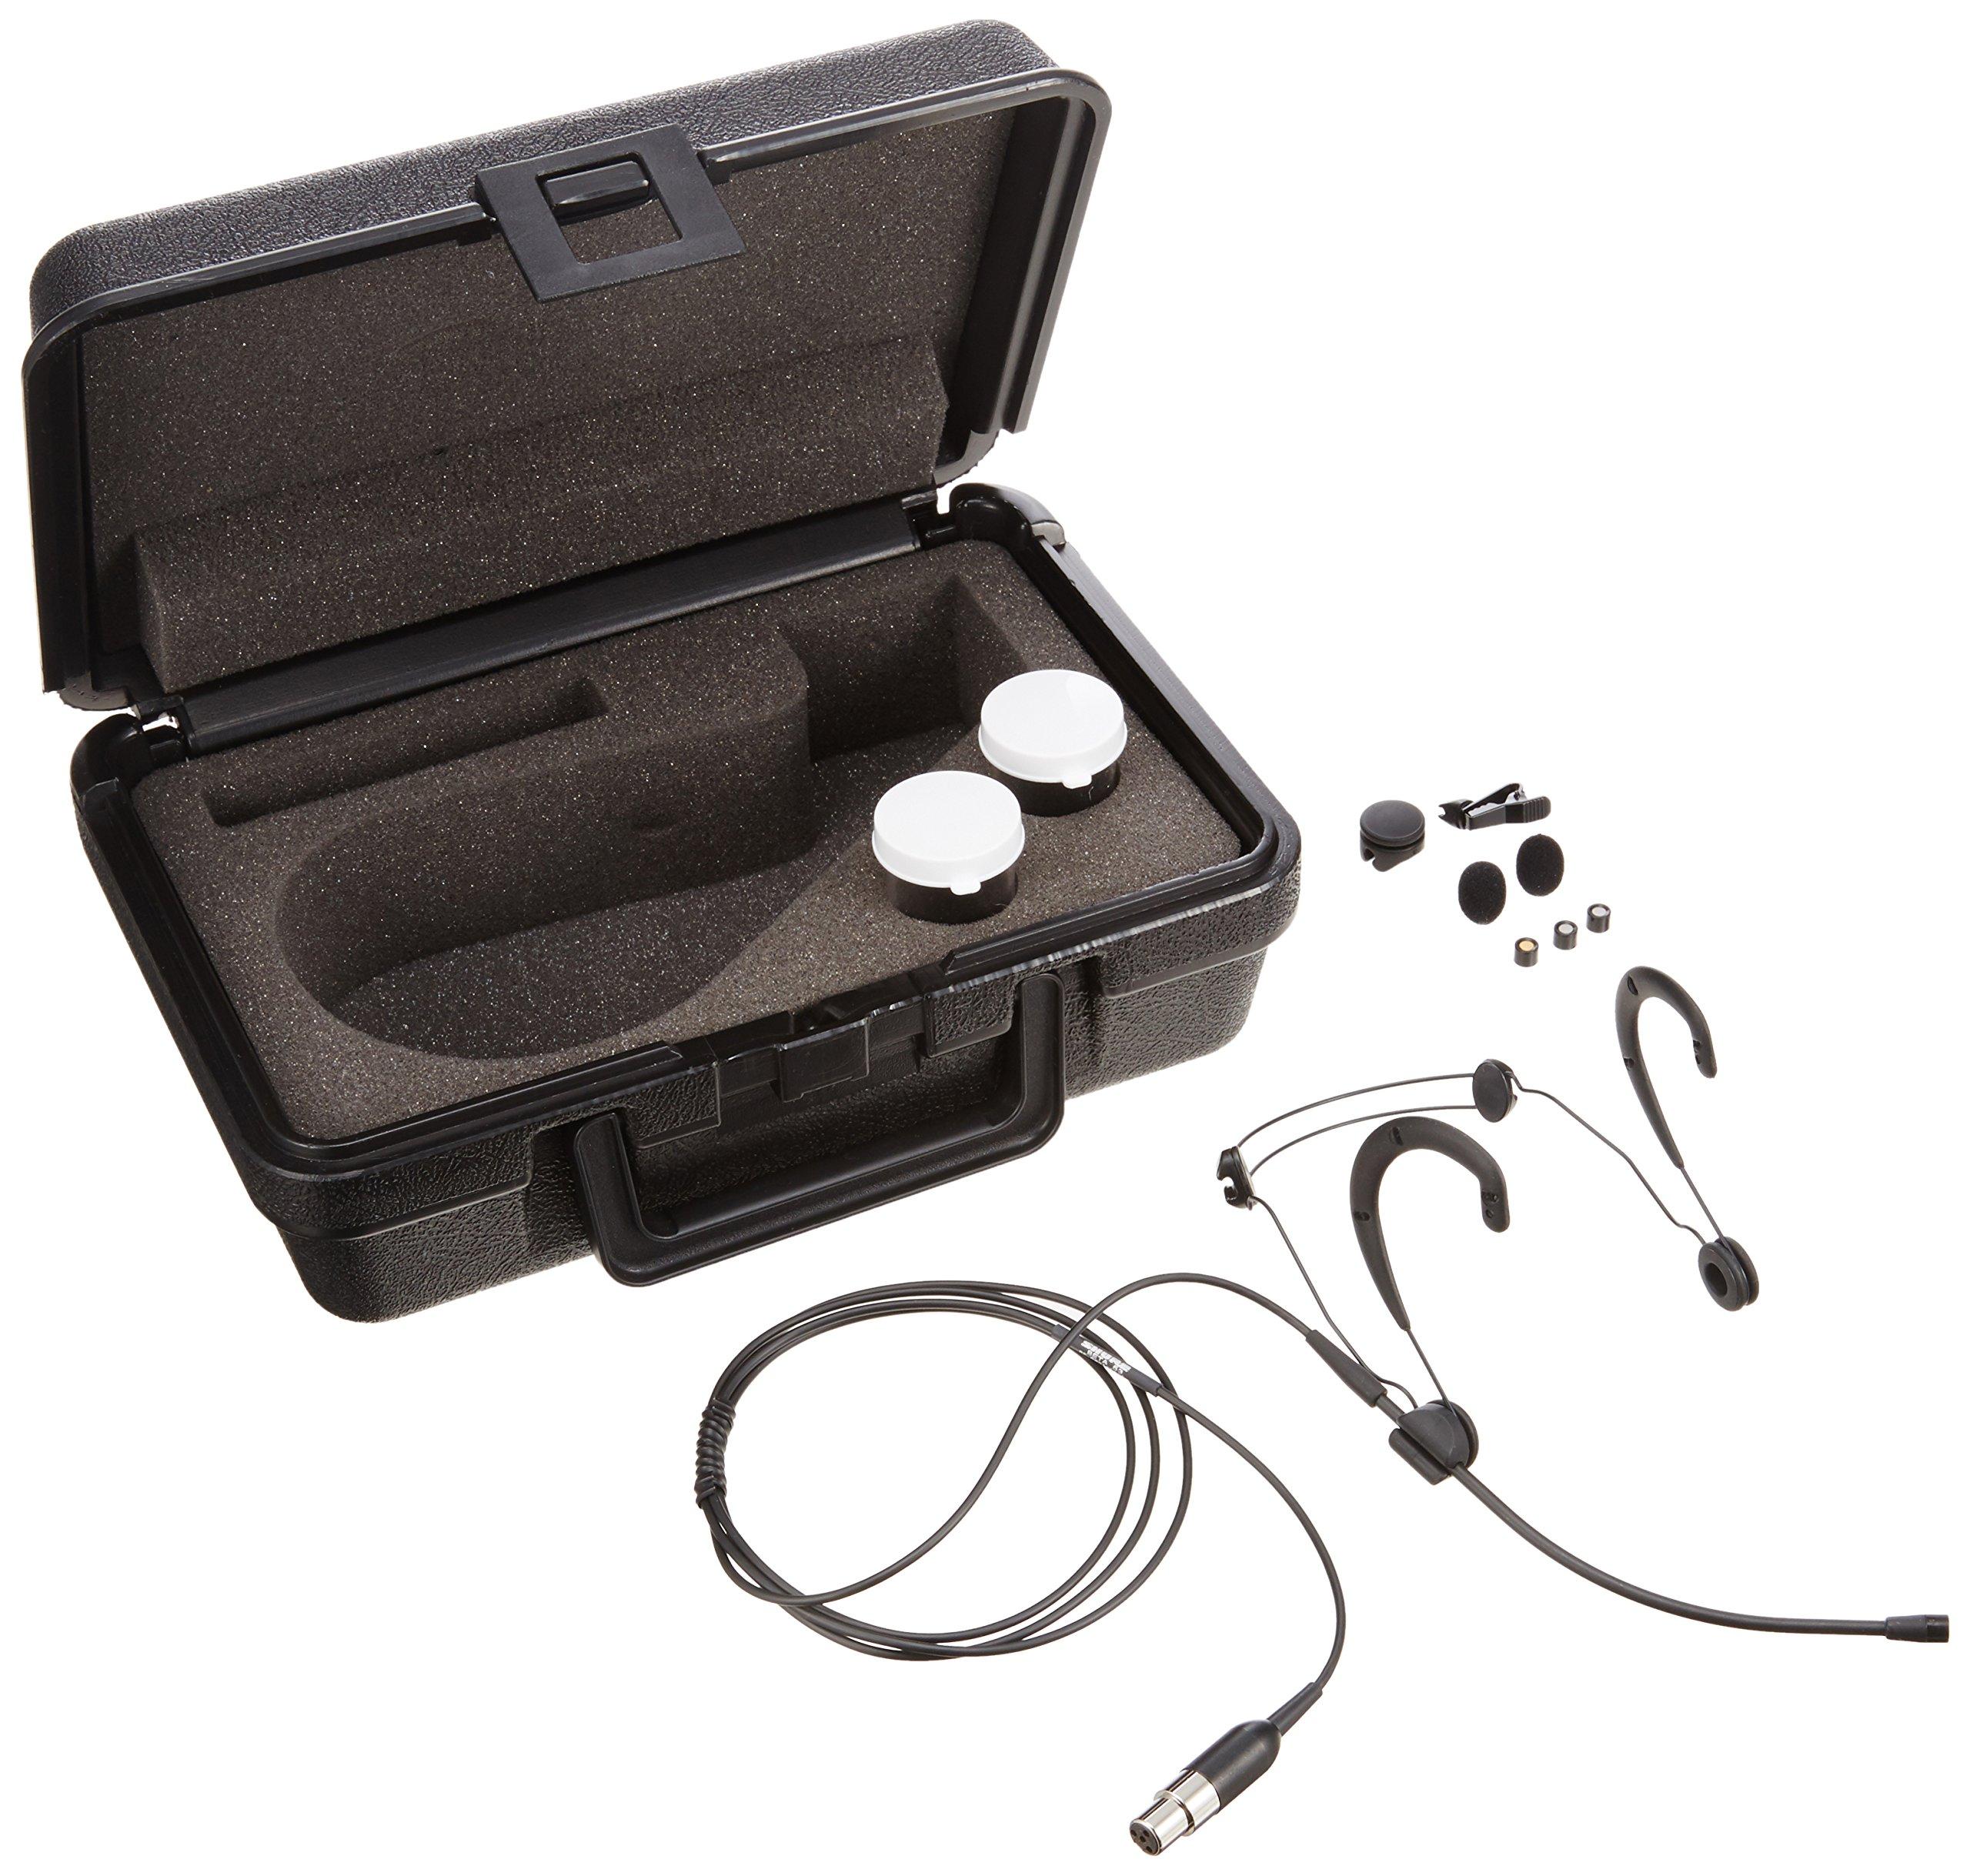 Shure WBH53B Headworn Vocal Microphone for Wireless, Omnidirectional Condenser